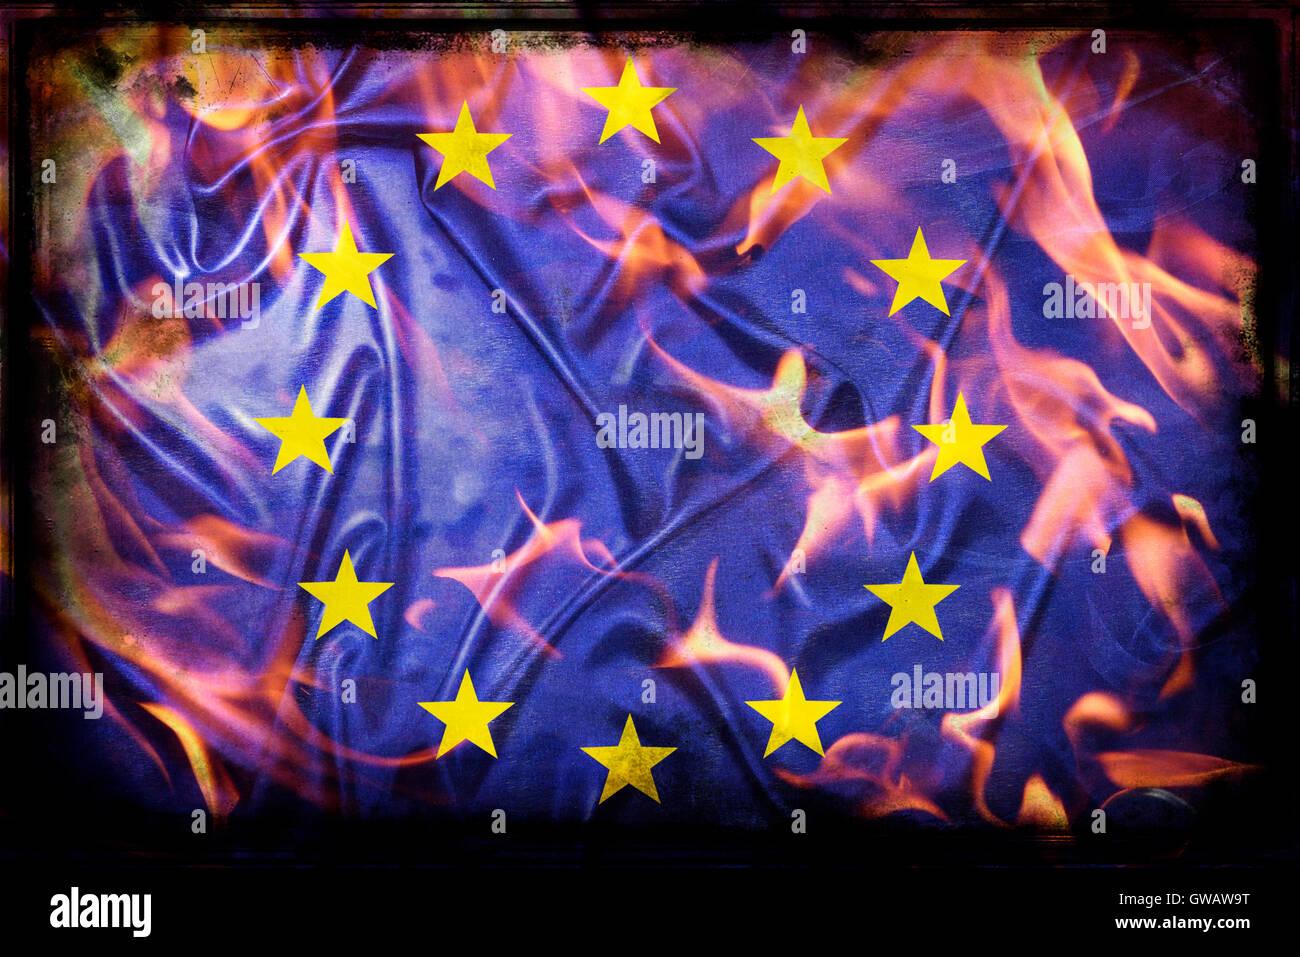 European flag in flames symbolic photo europe after the brexit european flag in flames symbolic photo europe after the brexit vote europa fahne in flammen symbolfoto europa nach dem brexit buycottarizona